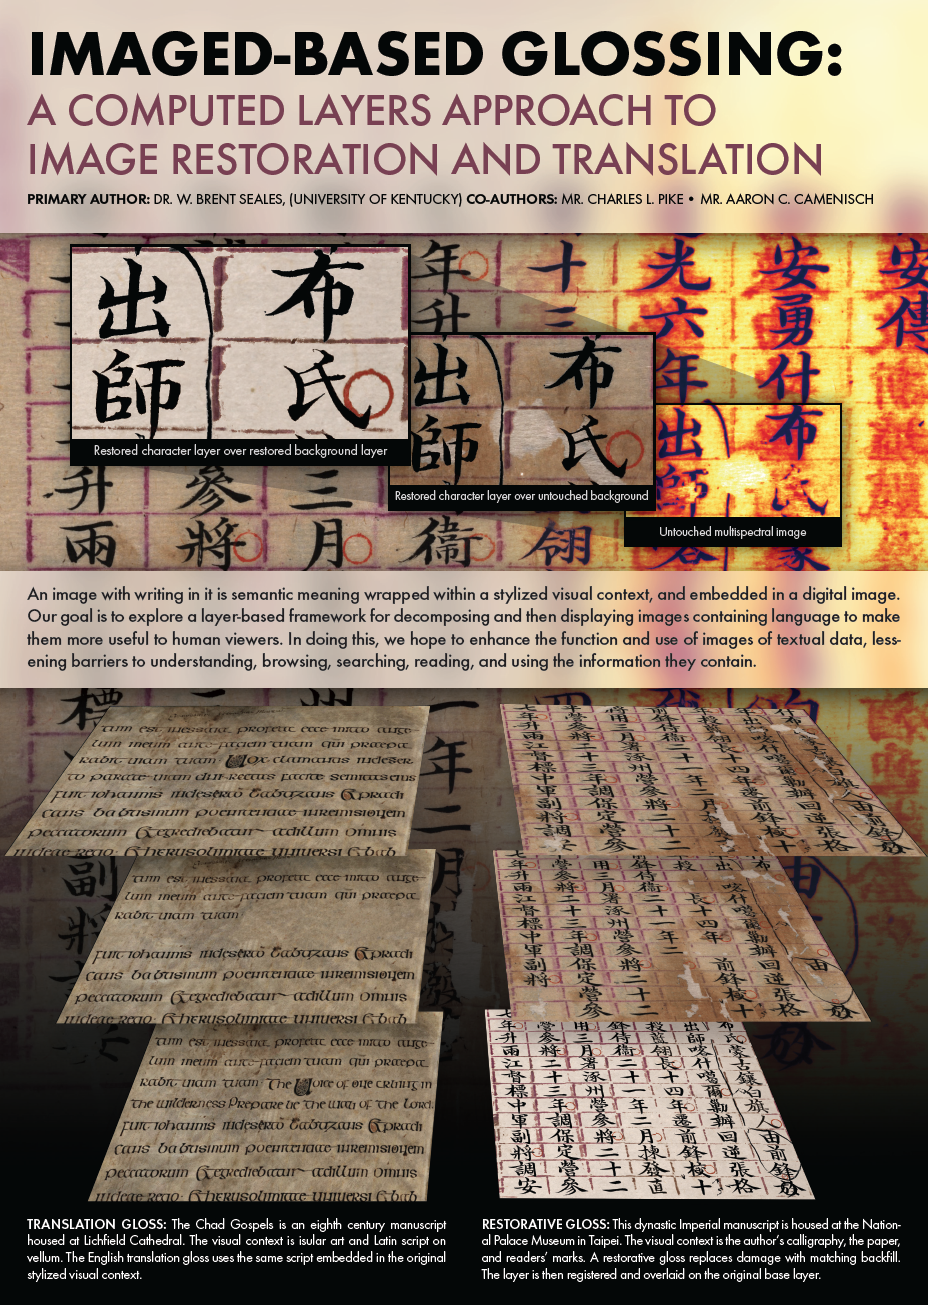 Image-Based Glossing - Historical Preservation - Print Design